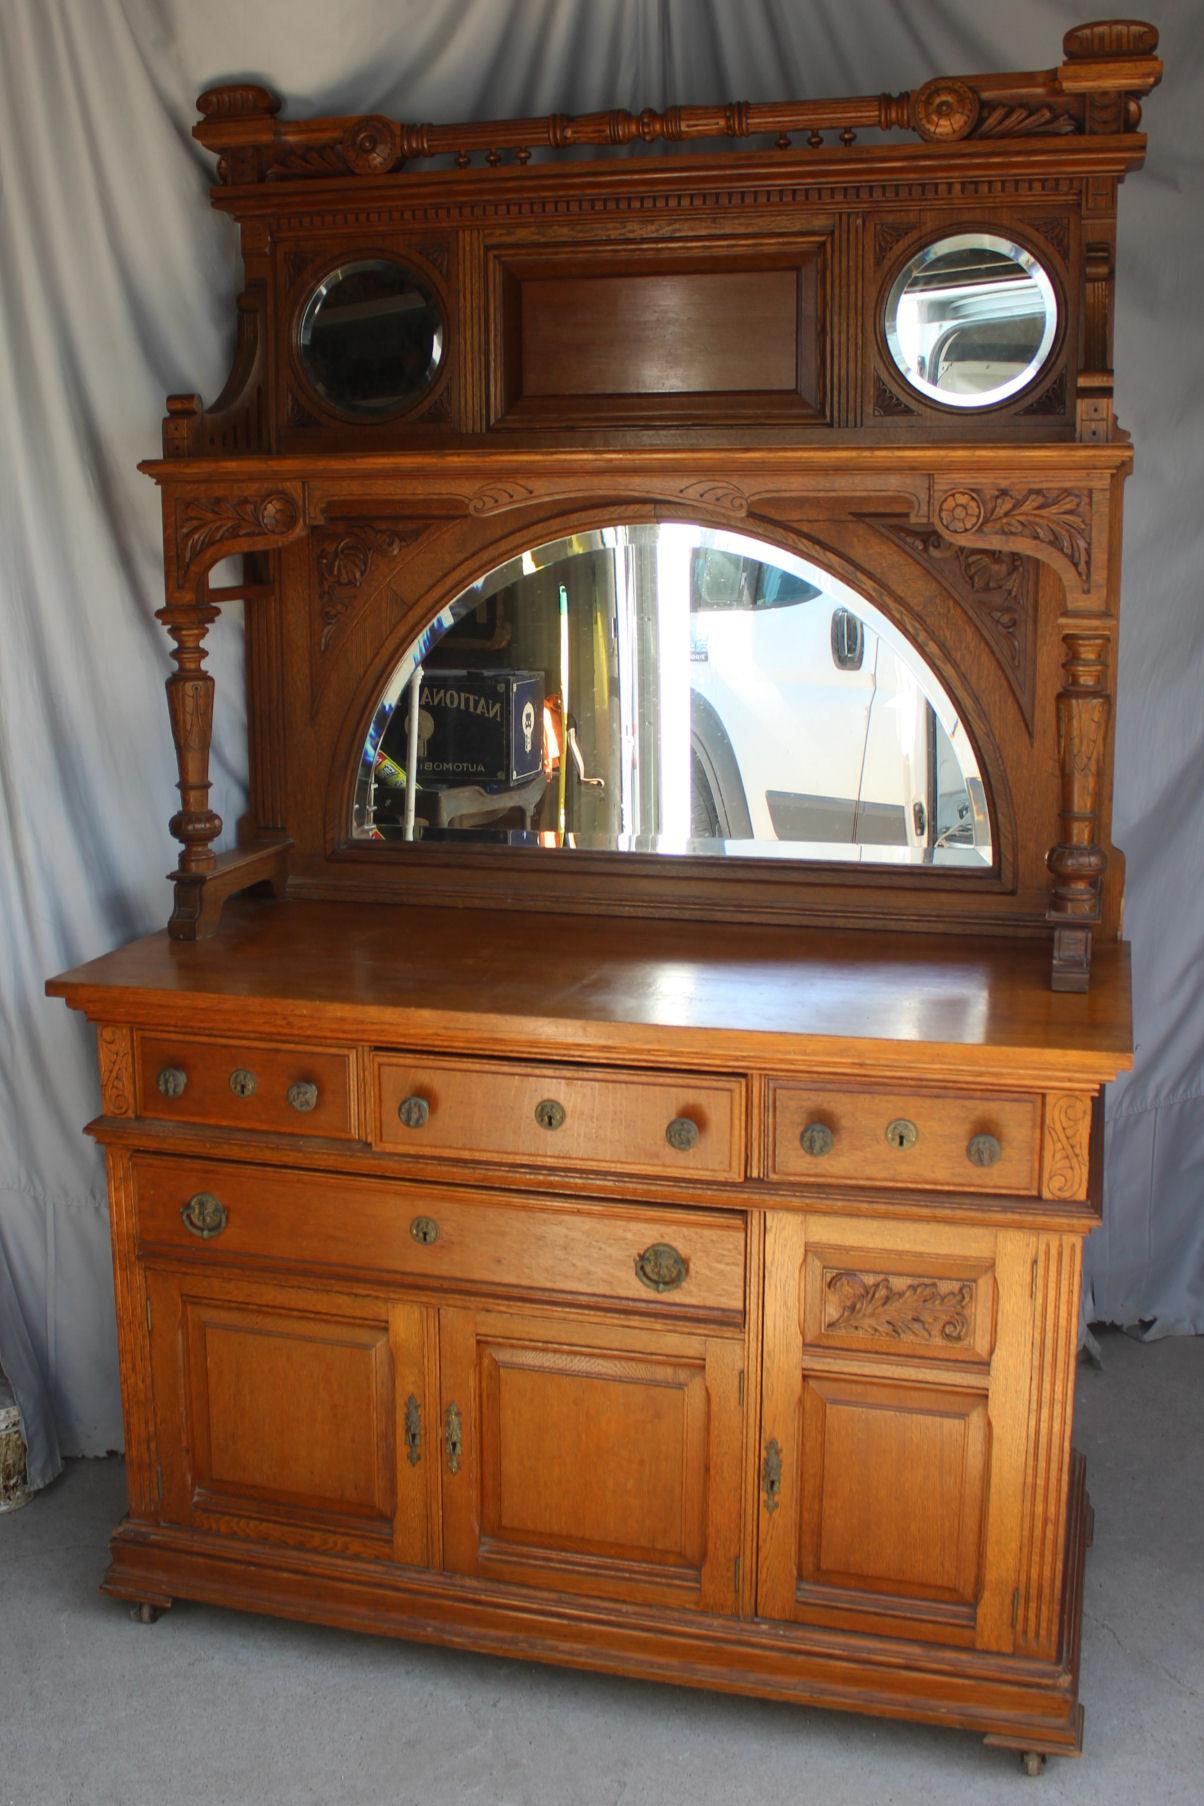 Bargain John S Antiques Antique Oak Sideboard Buffet Hidden Iron Strong Box In Drawer Bargain John S Antiques